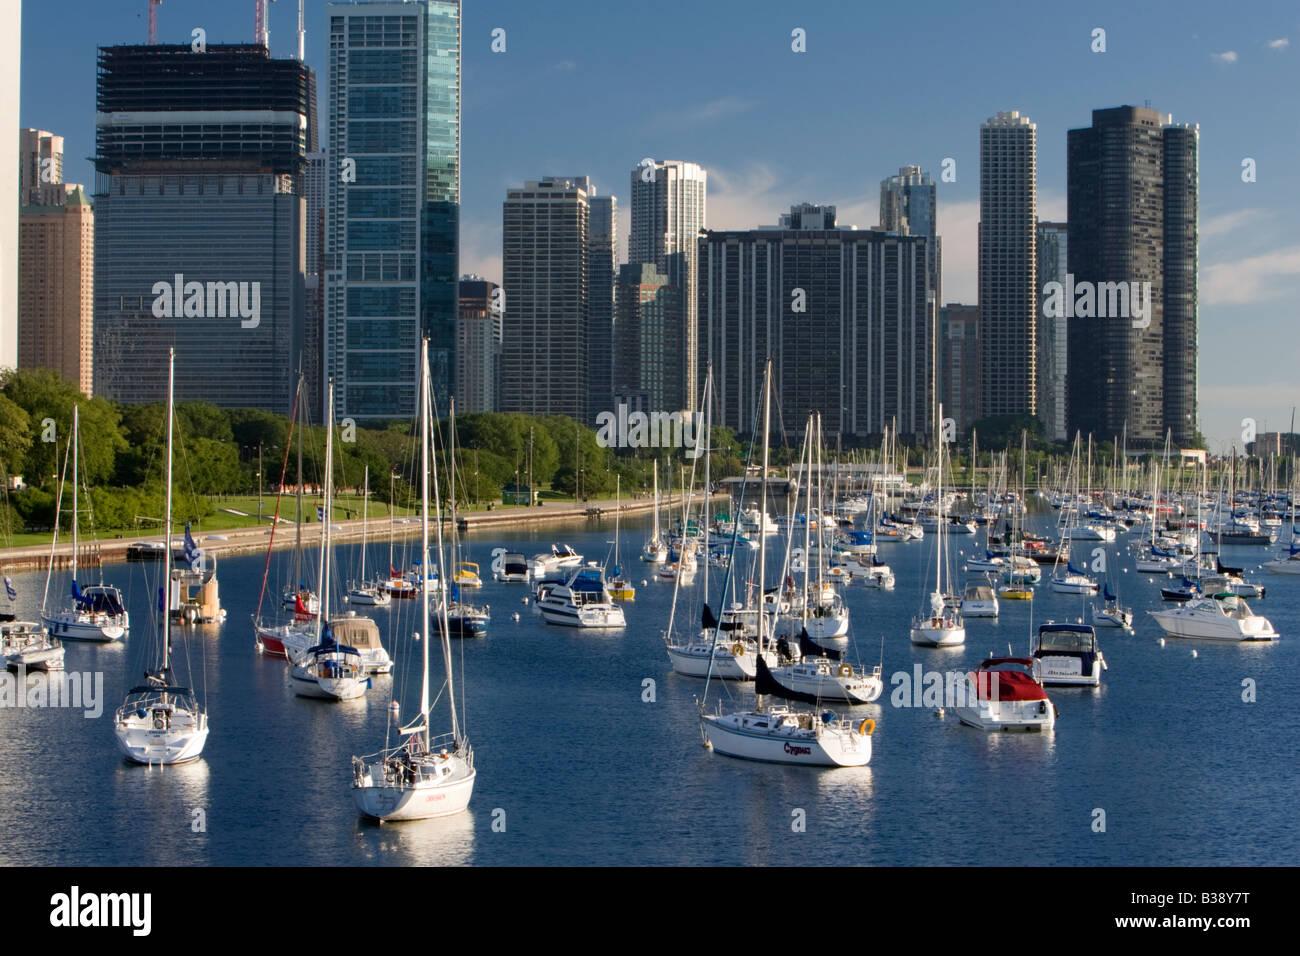 Chicago, Illinois. Chicago Hôtels, Condos, le lac Michigan Marina en premier plan. Photo Stock